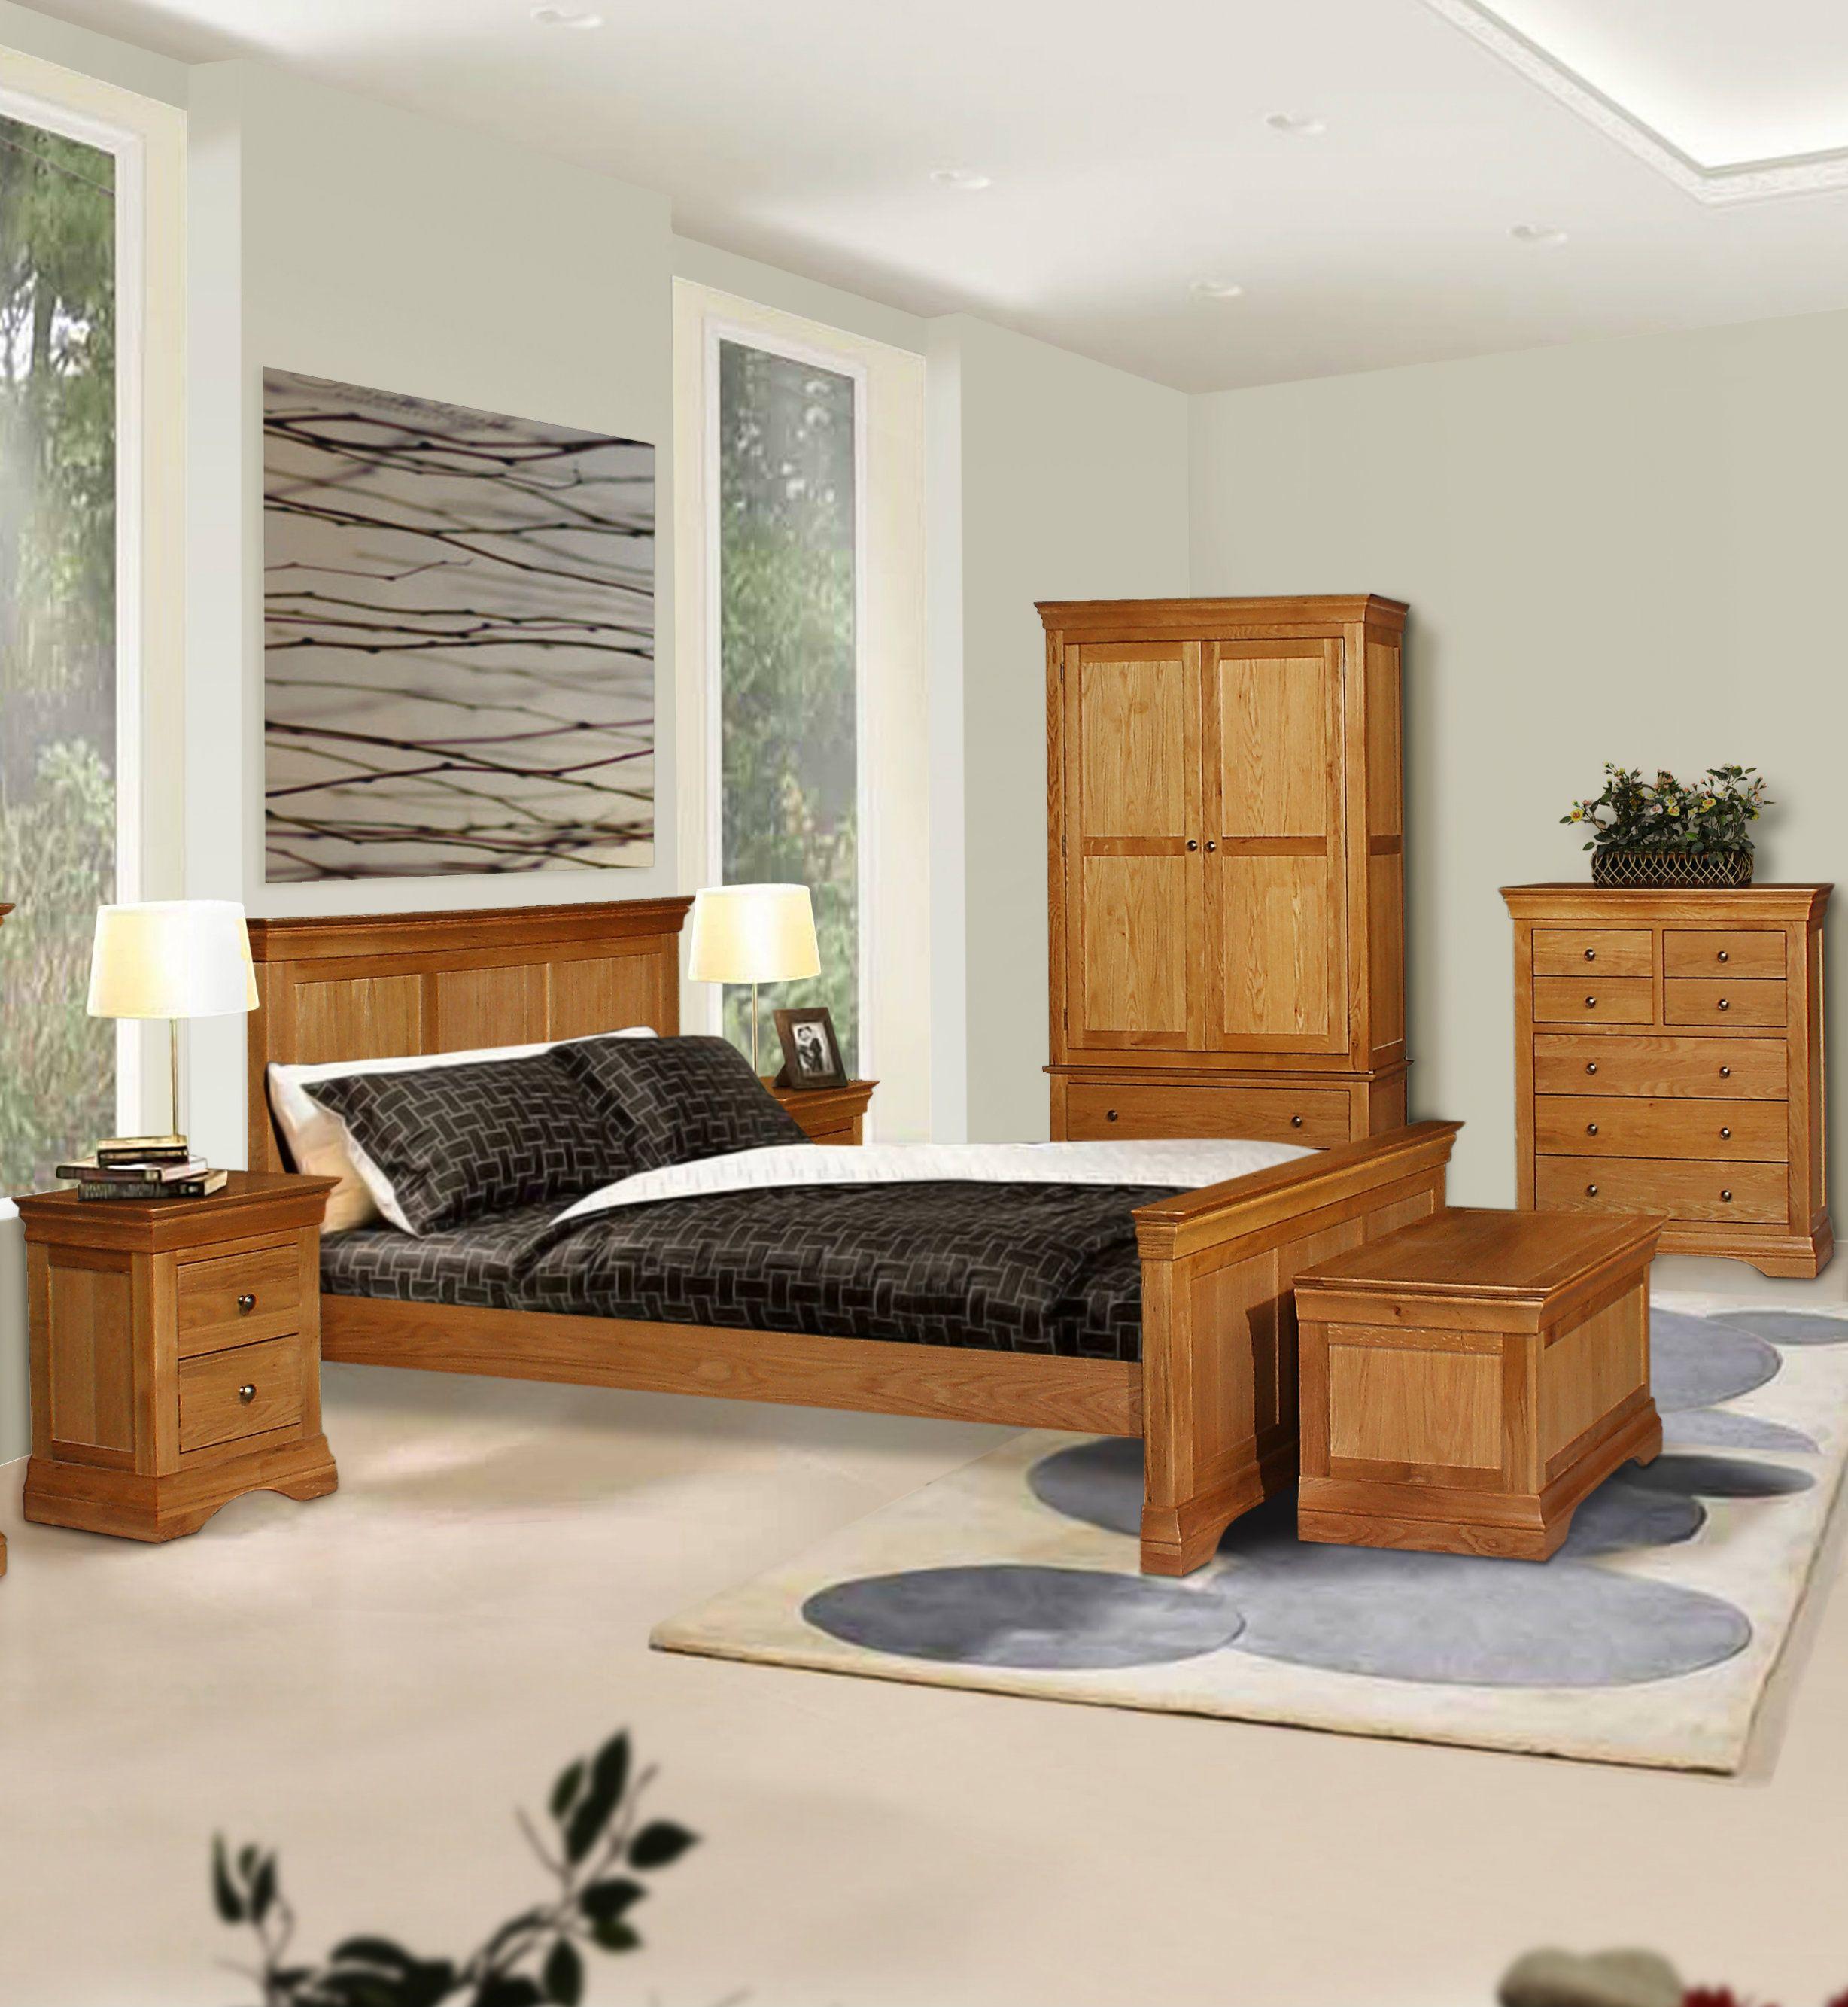 beautiful durant oak bed bedside cabinet blanket box chest rh pinterest com beautiful bedroom furniture direct beautiful bedroom furniture reasonable price